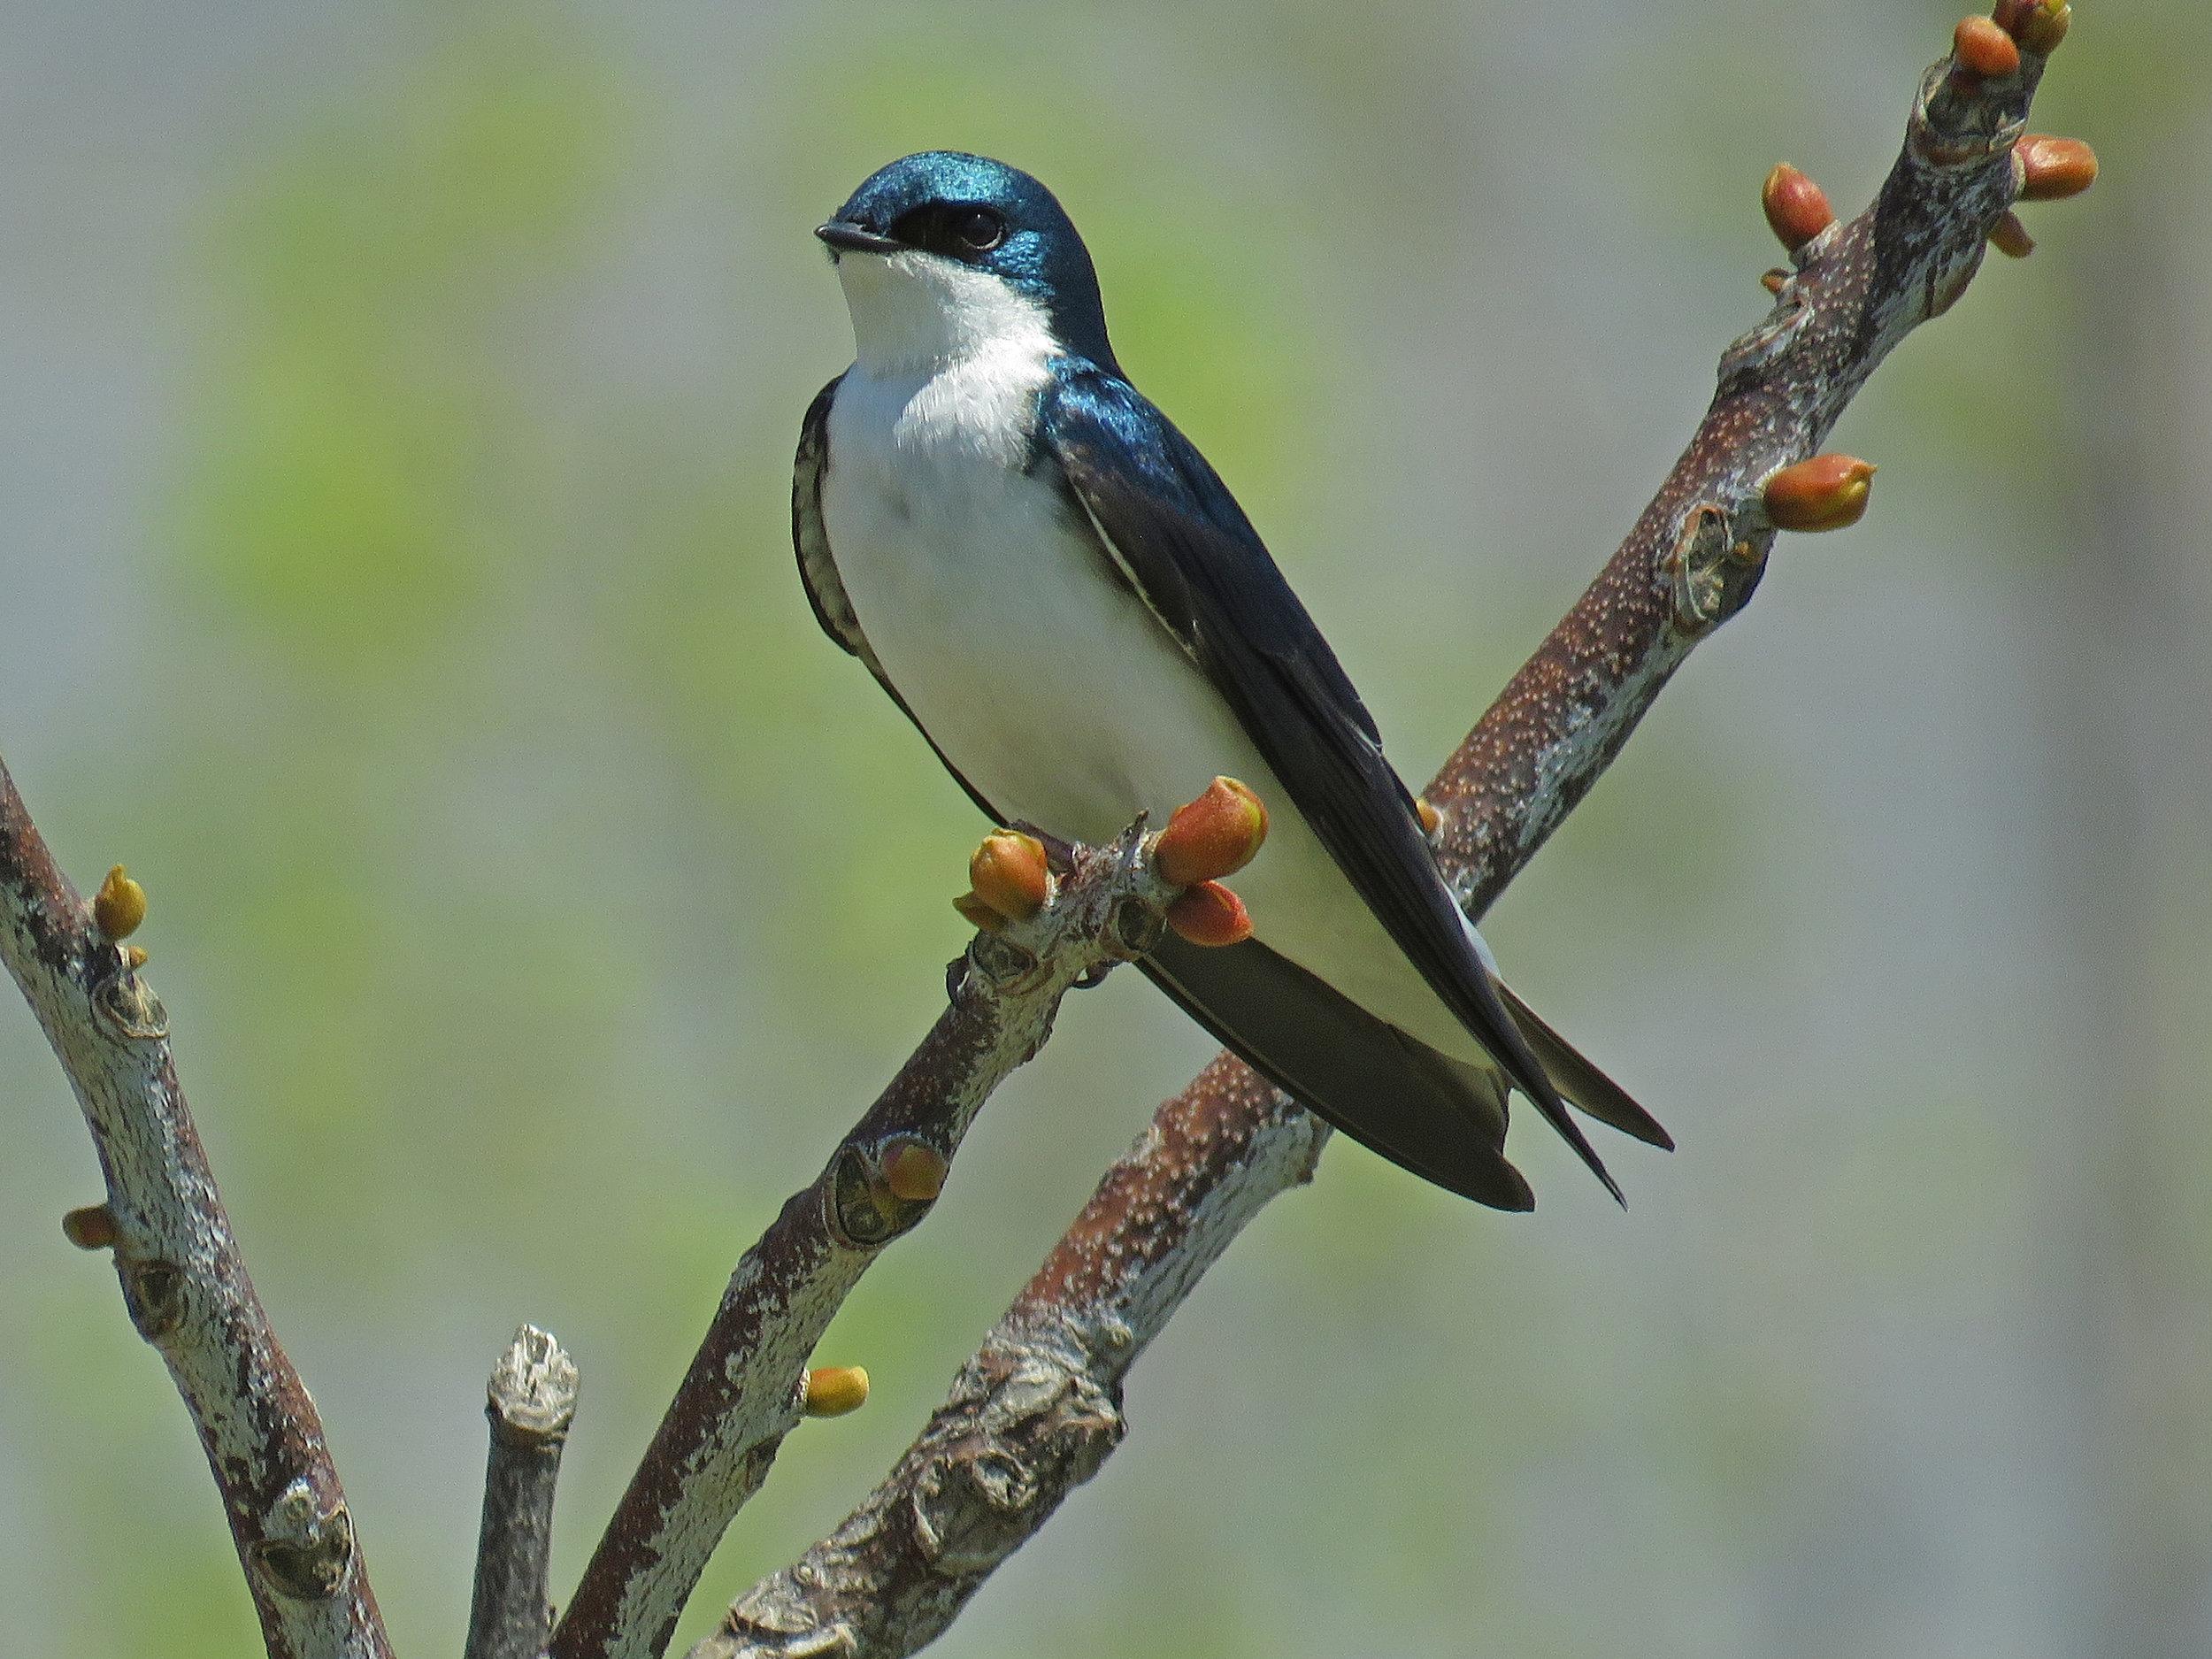 Tree swallow, Governors Island, May 1, 2018